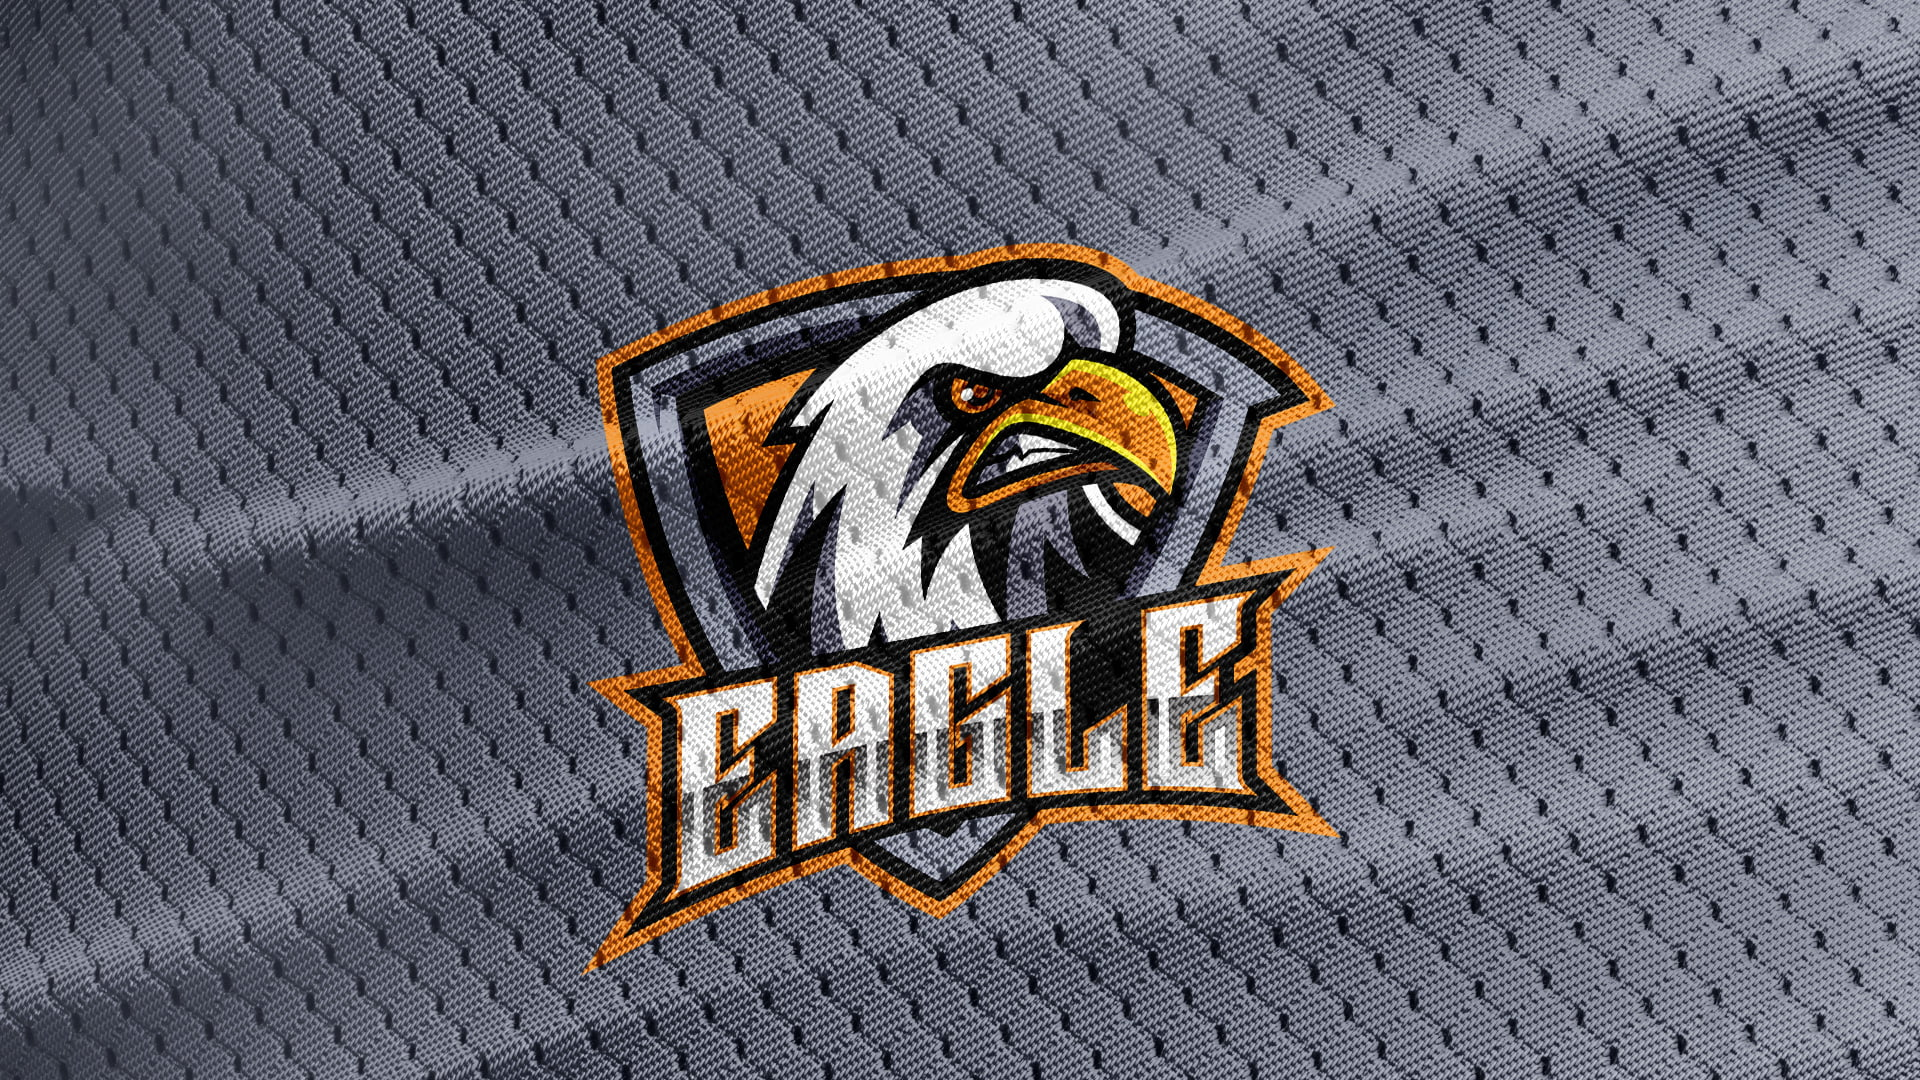 Jersey-Texture-Free-Eagle-Logo-Mascot